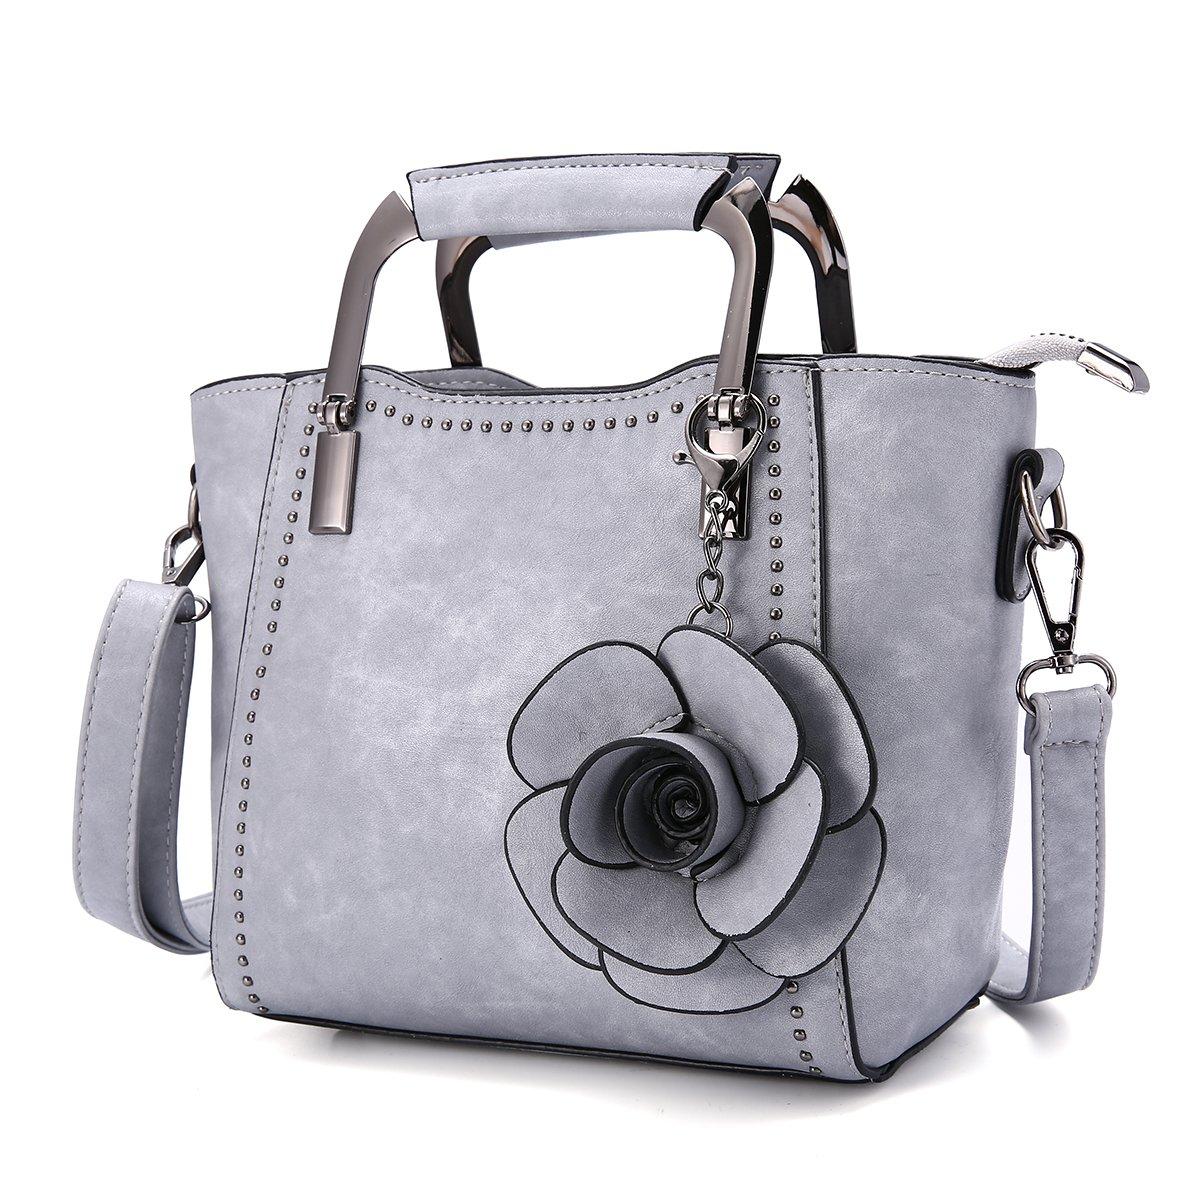 Top-Handle Bags, JOSEKO Women PU Leather Retro Rose Handbag Mini Crossbody Bag Grey 7.48''(L) x 3.94''(W) x 7.09''(H)